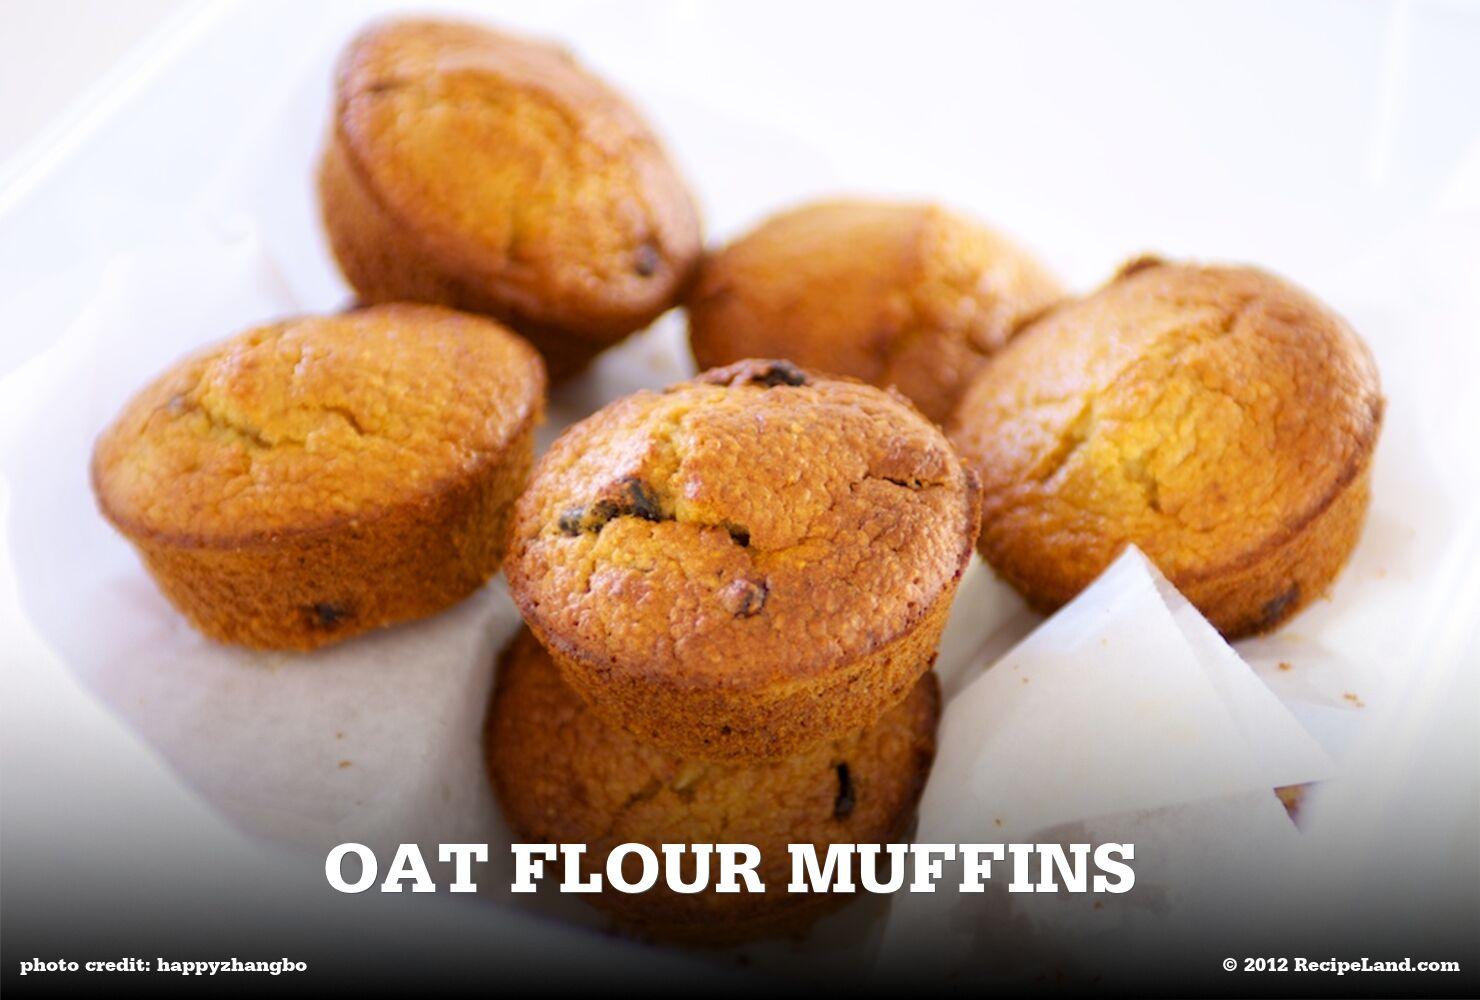 Oat Flour Muffins